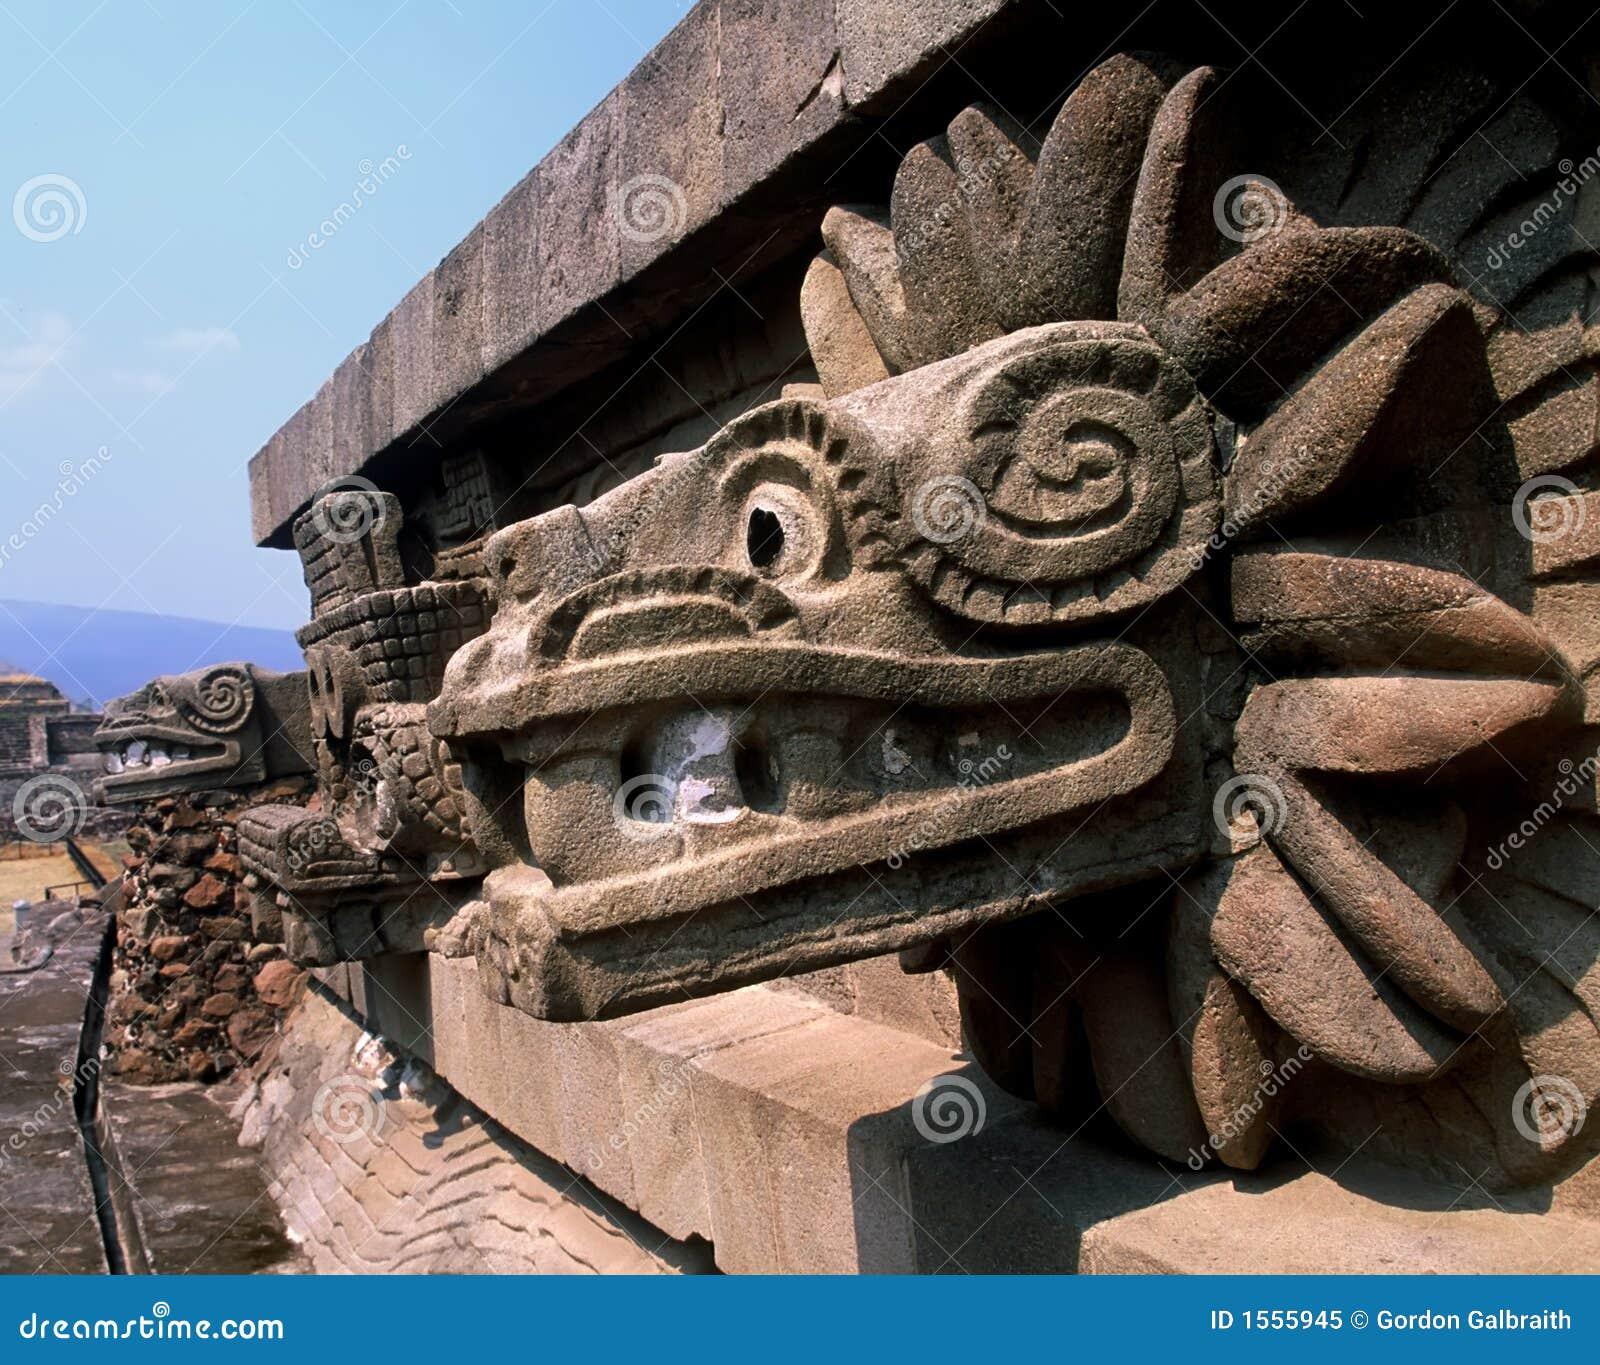 Serpent Quetzalcoatl Royalty Free Stock Photo - Image: 1555945